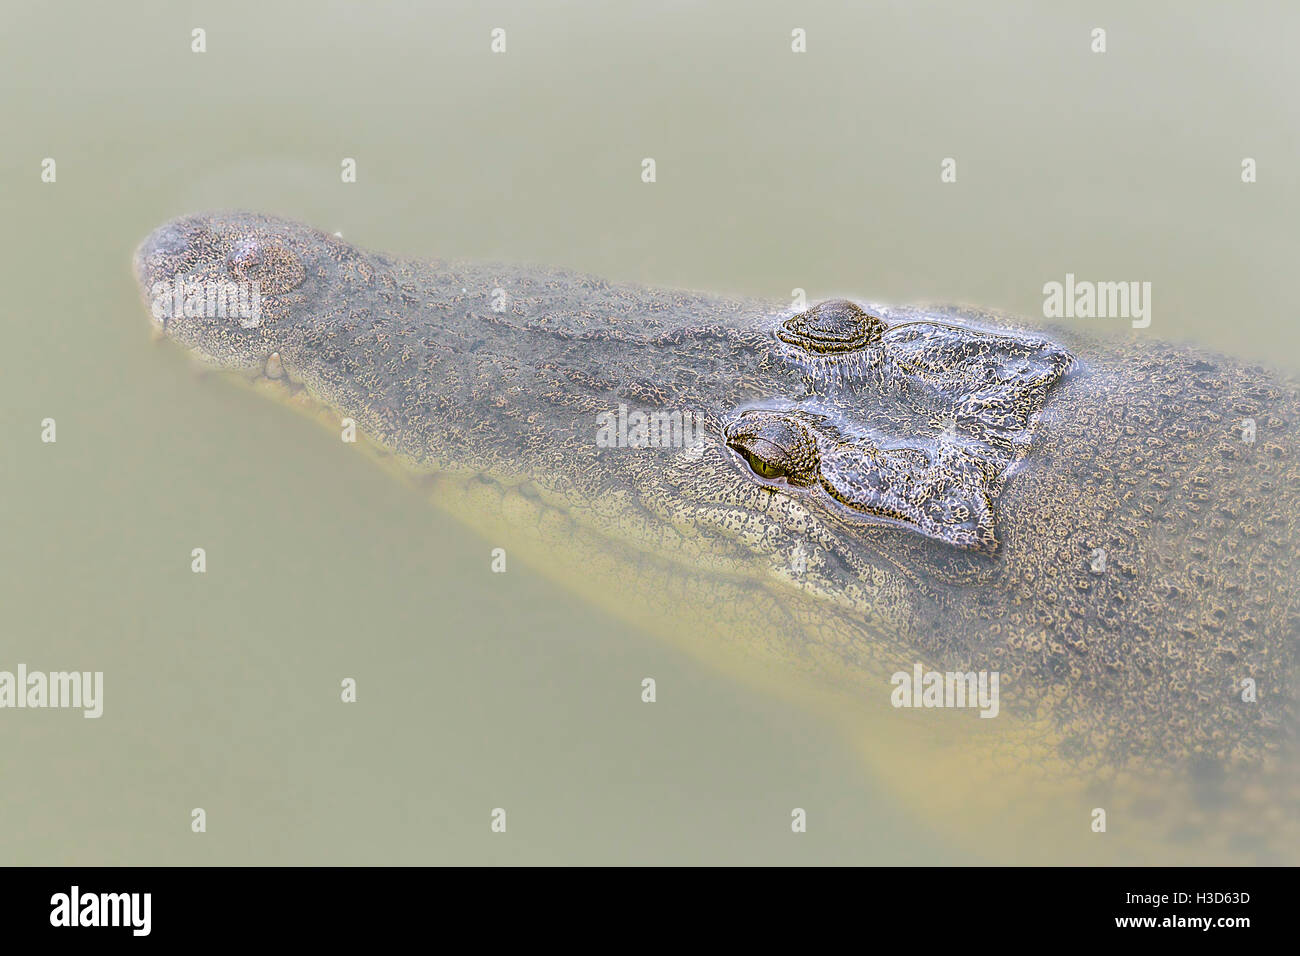 Close-up of a Saltwater Crocodile (Crocodylus porosus) submerged in a mangrove river, Sungei Buloh, Singapore - Stock Image